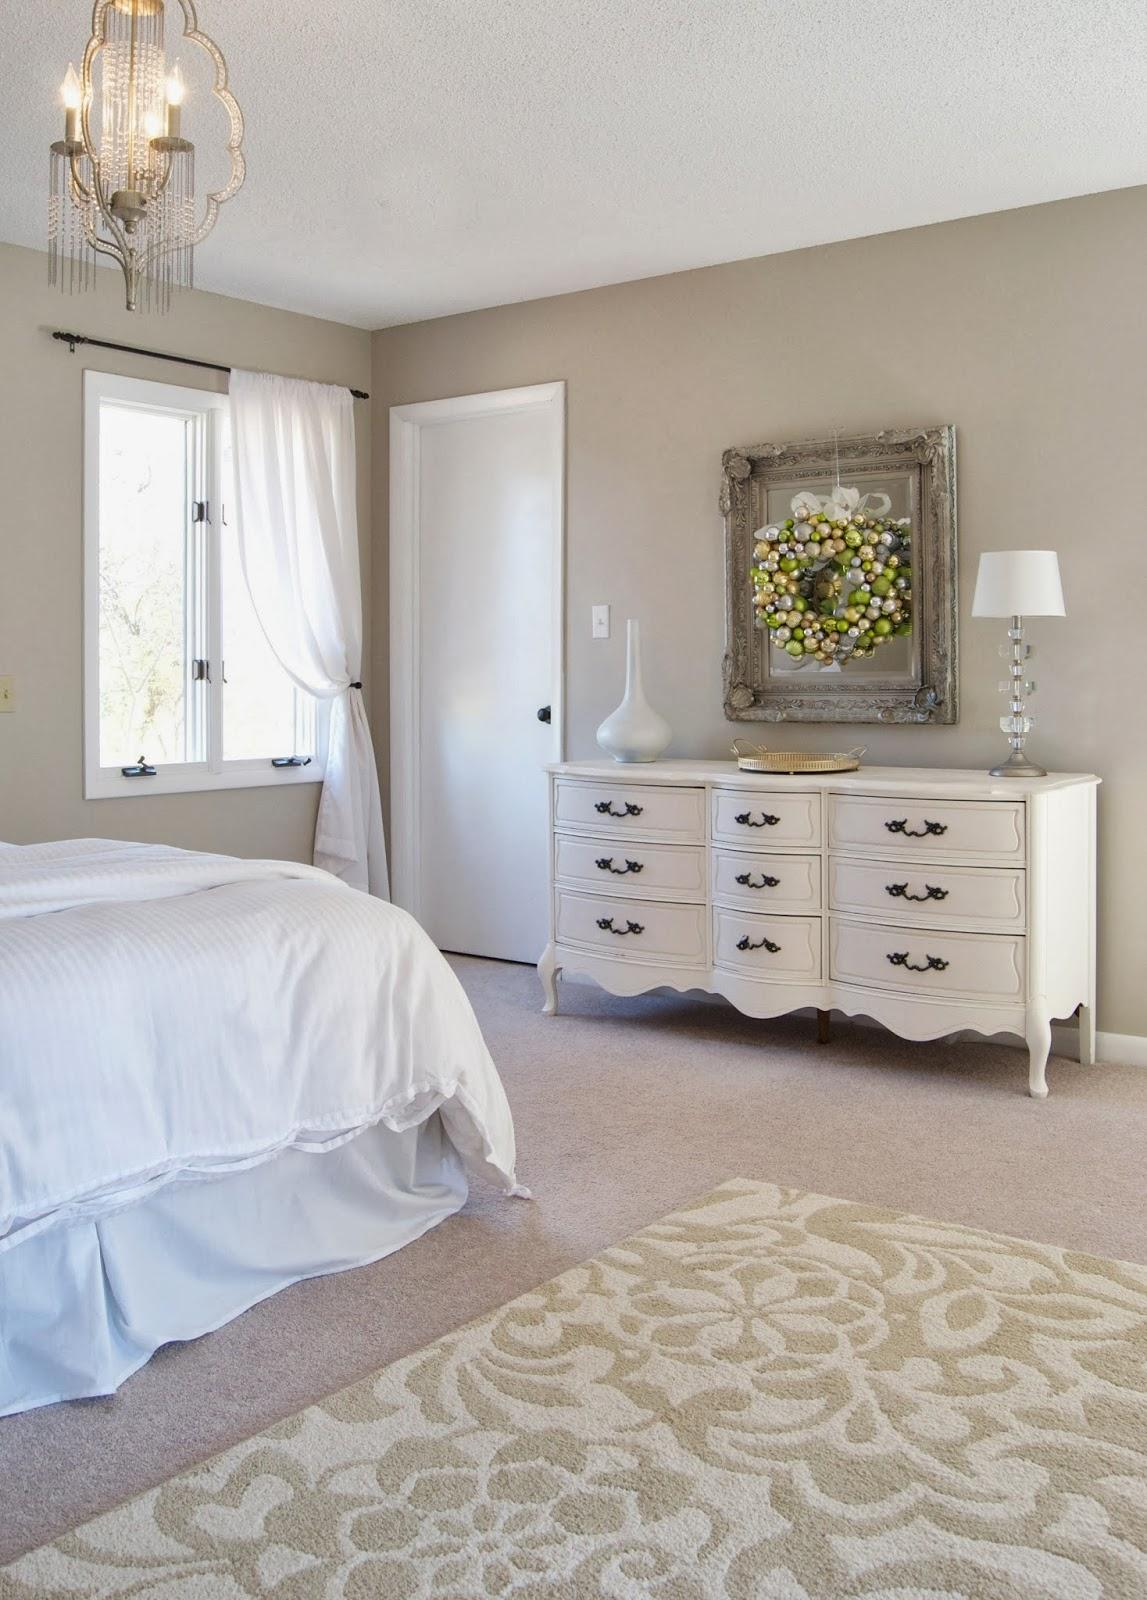 heres - Bedroom Ornament Ideas